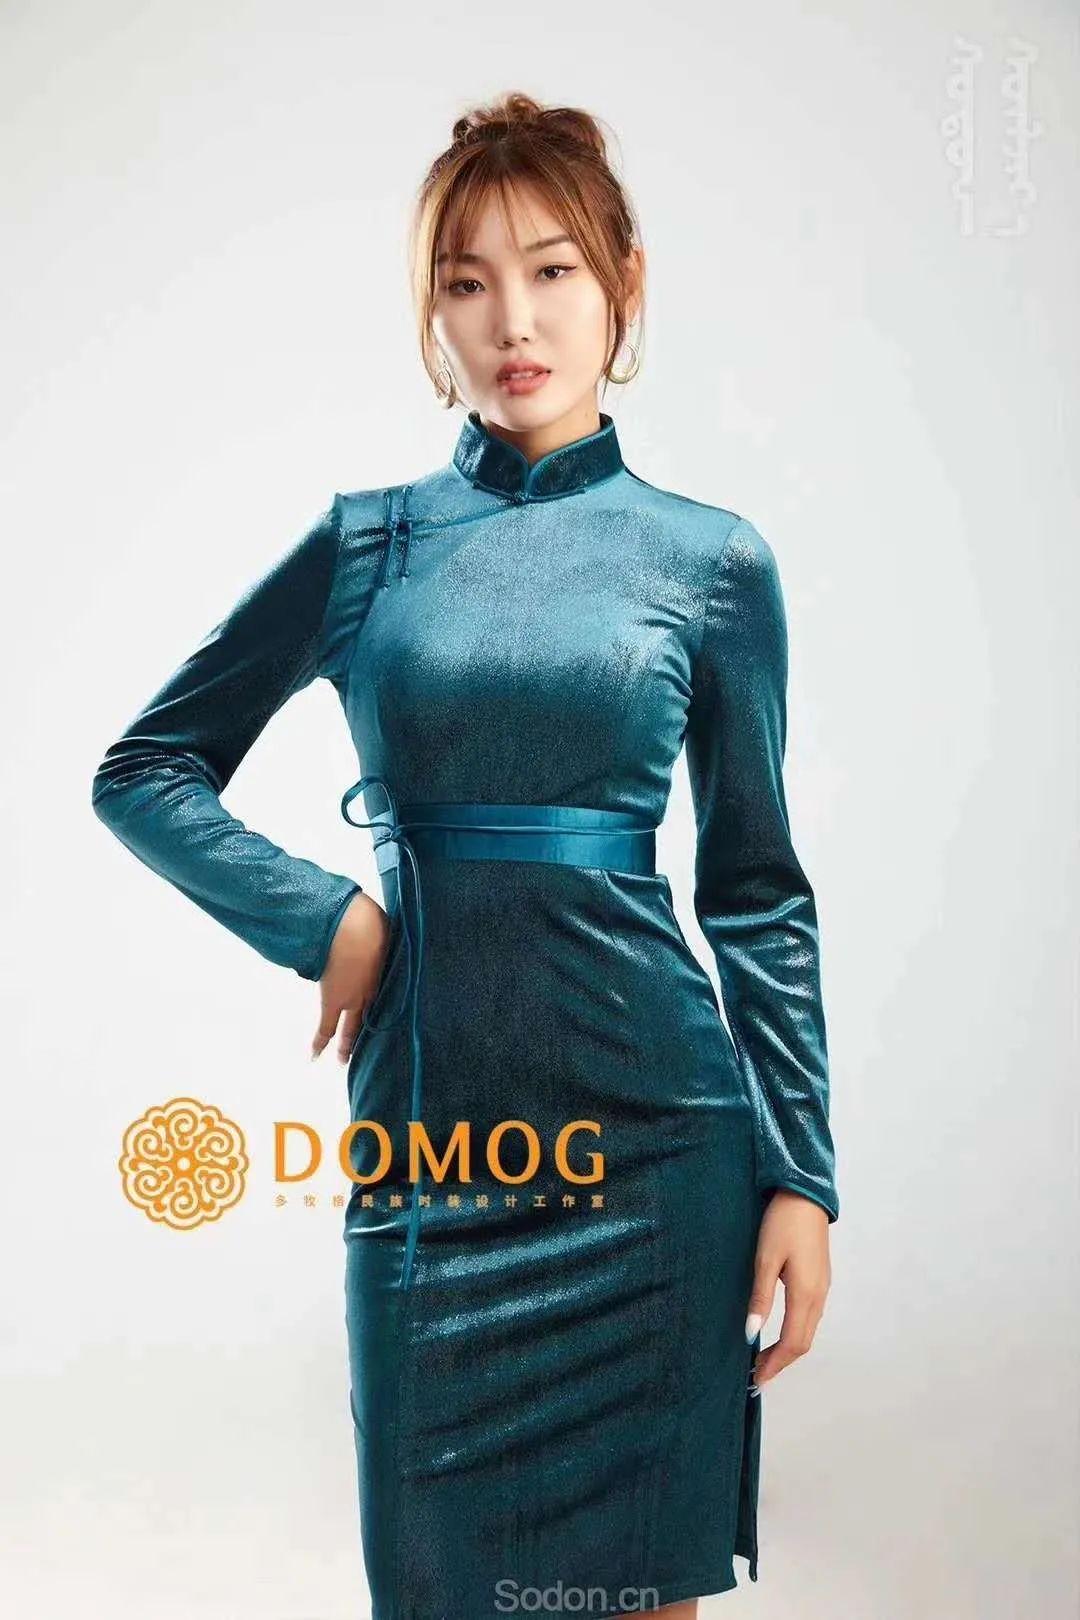 DOMOG 蒙古时装2020新款,民族与时尚的融合 第48张 DOMOG 蒙古时装2020新款,民族与时尚的融合 蒙古服饰